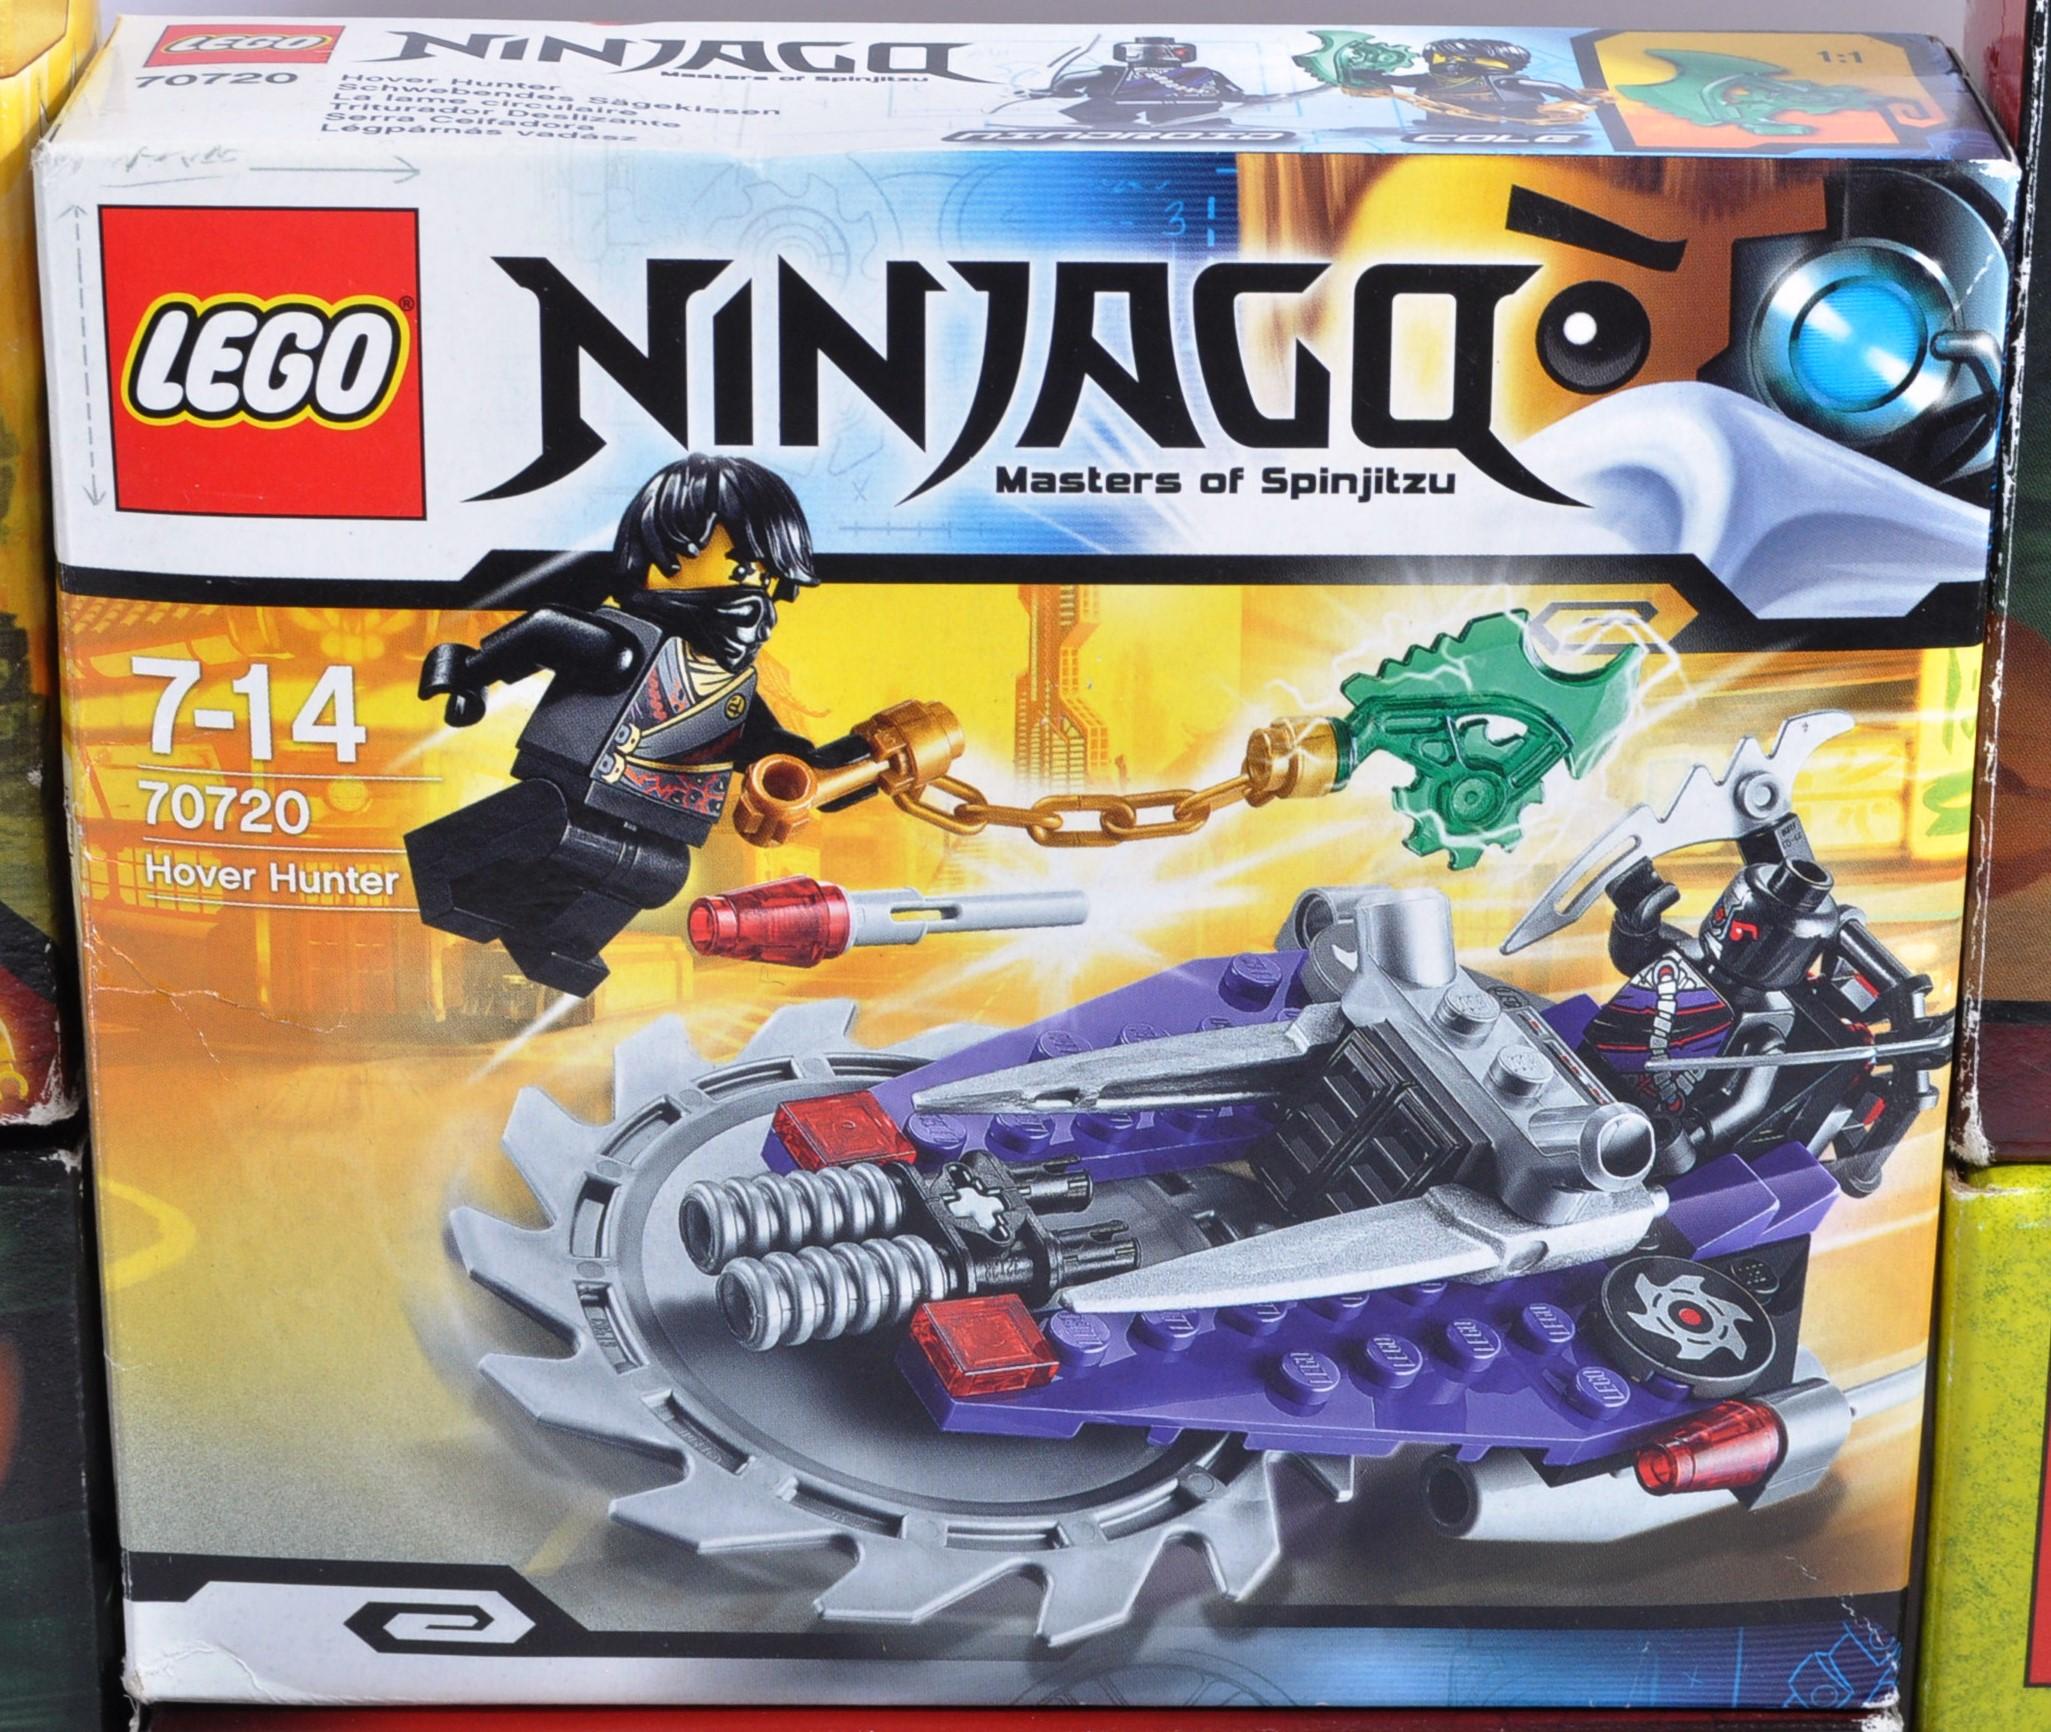 LEGO SETS - LEGO NINJAGO - COLLECTION OF X8 LEGO NINJAGO SETS - Image 4 of 9